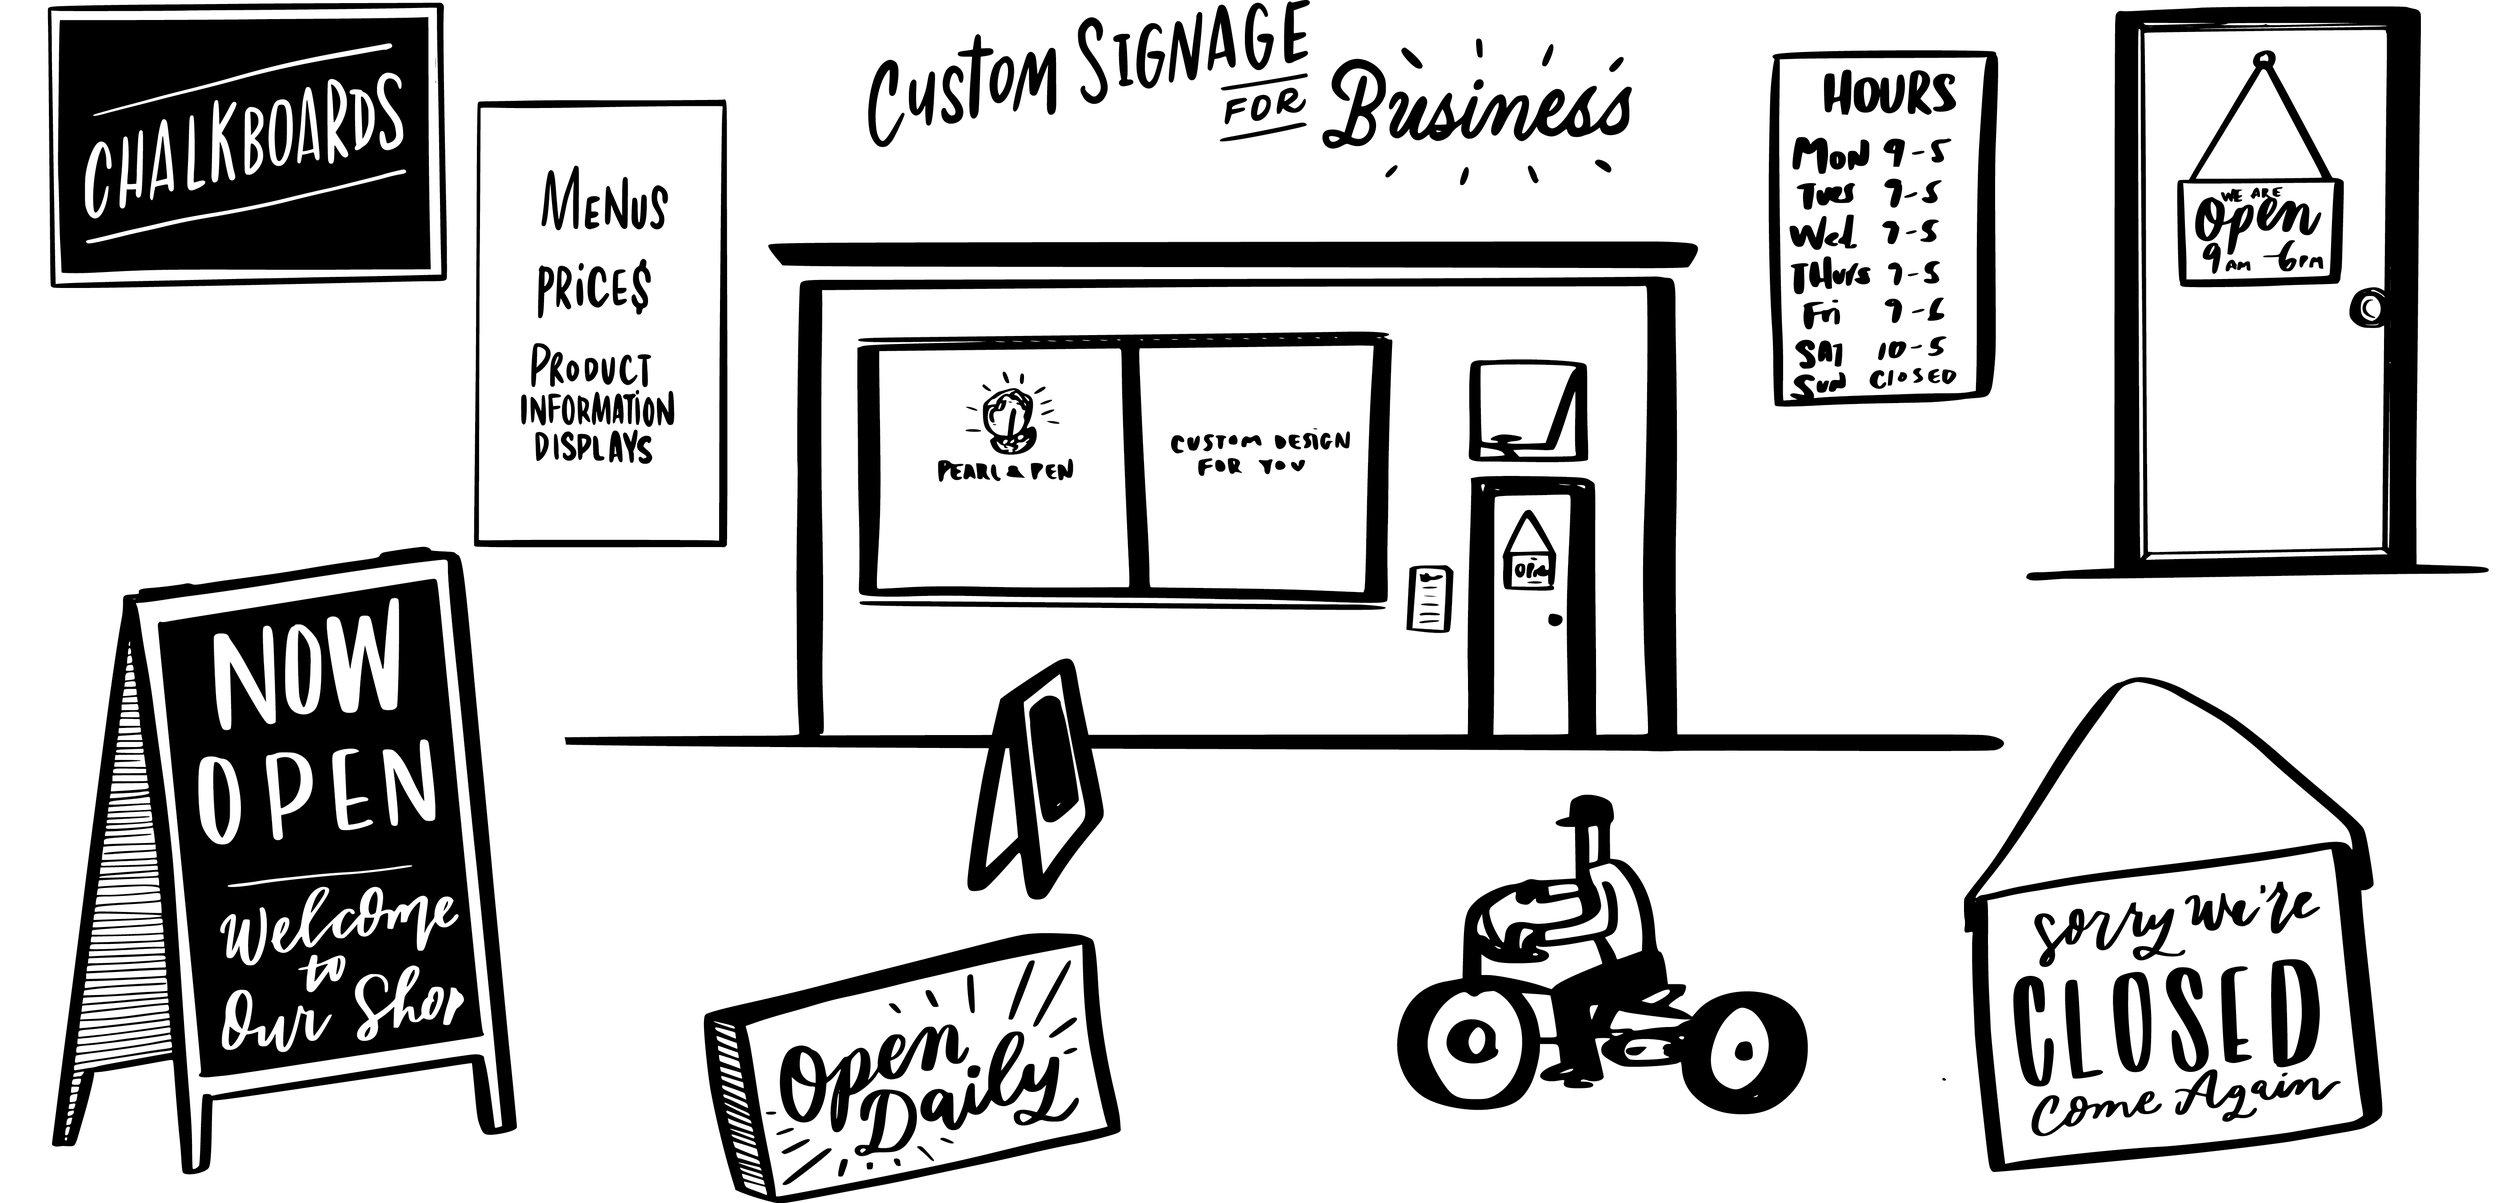 customsignageforbusiness_information_illustration_slice.jpg